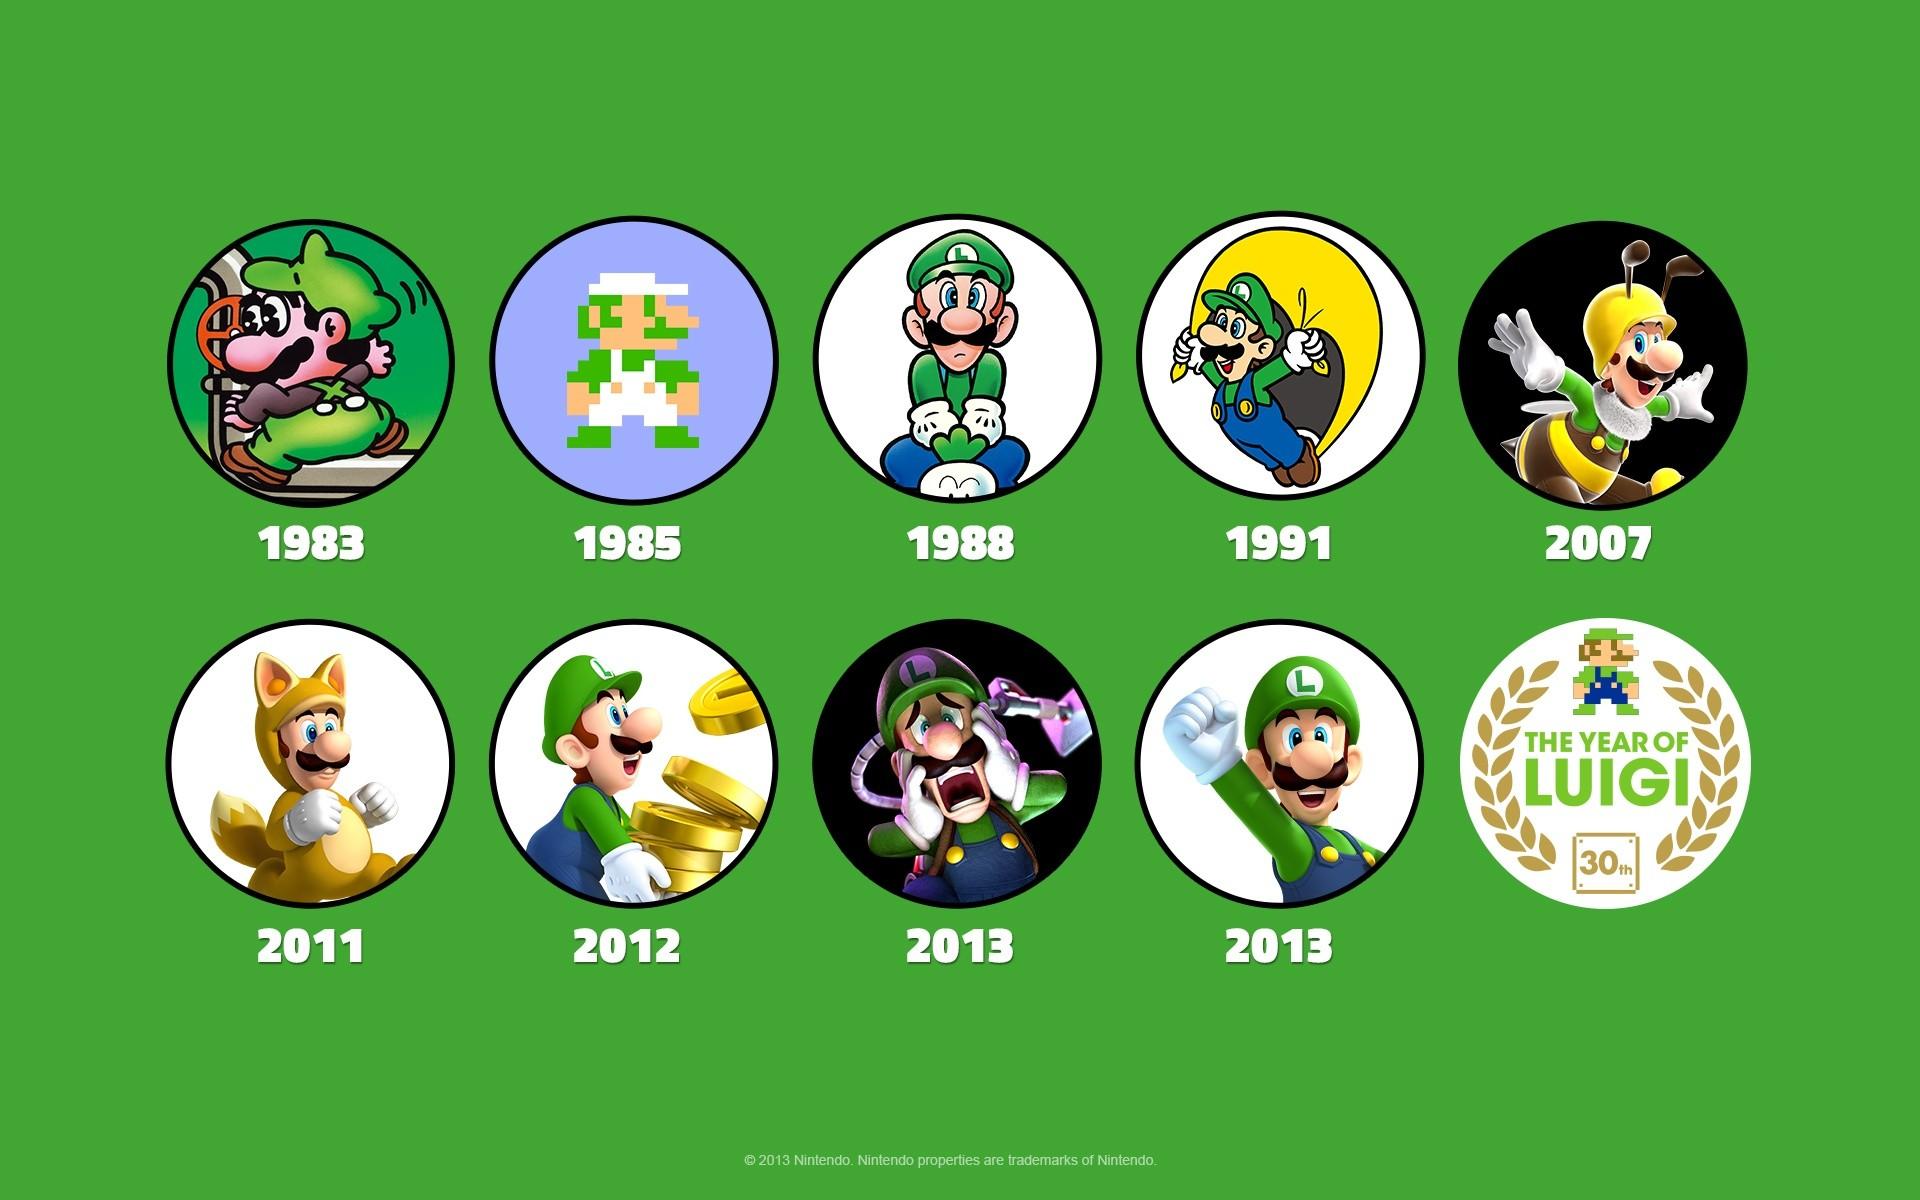 Nintendo President Satoru Iwata said that The Year of Luigi will .